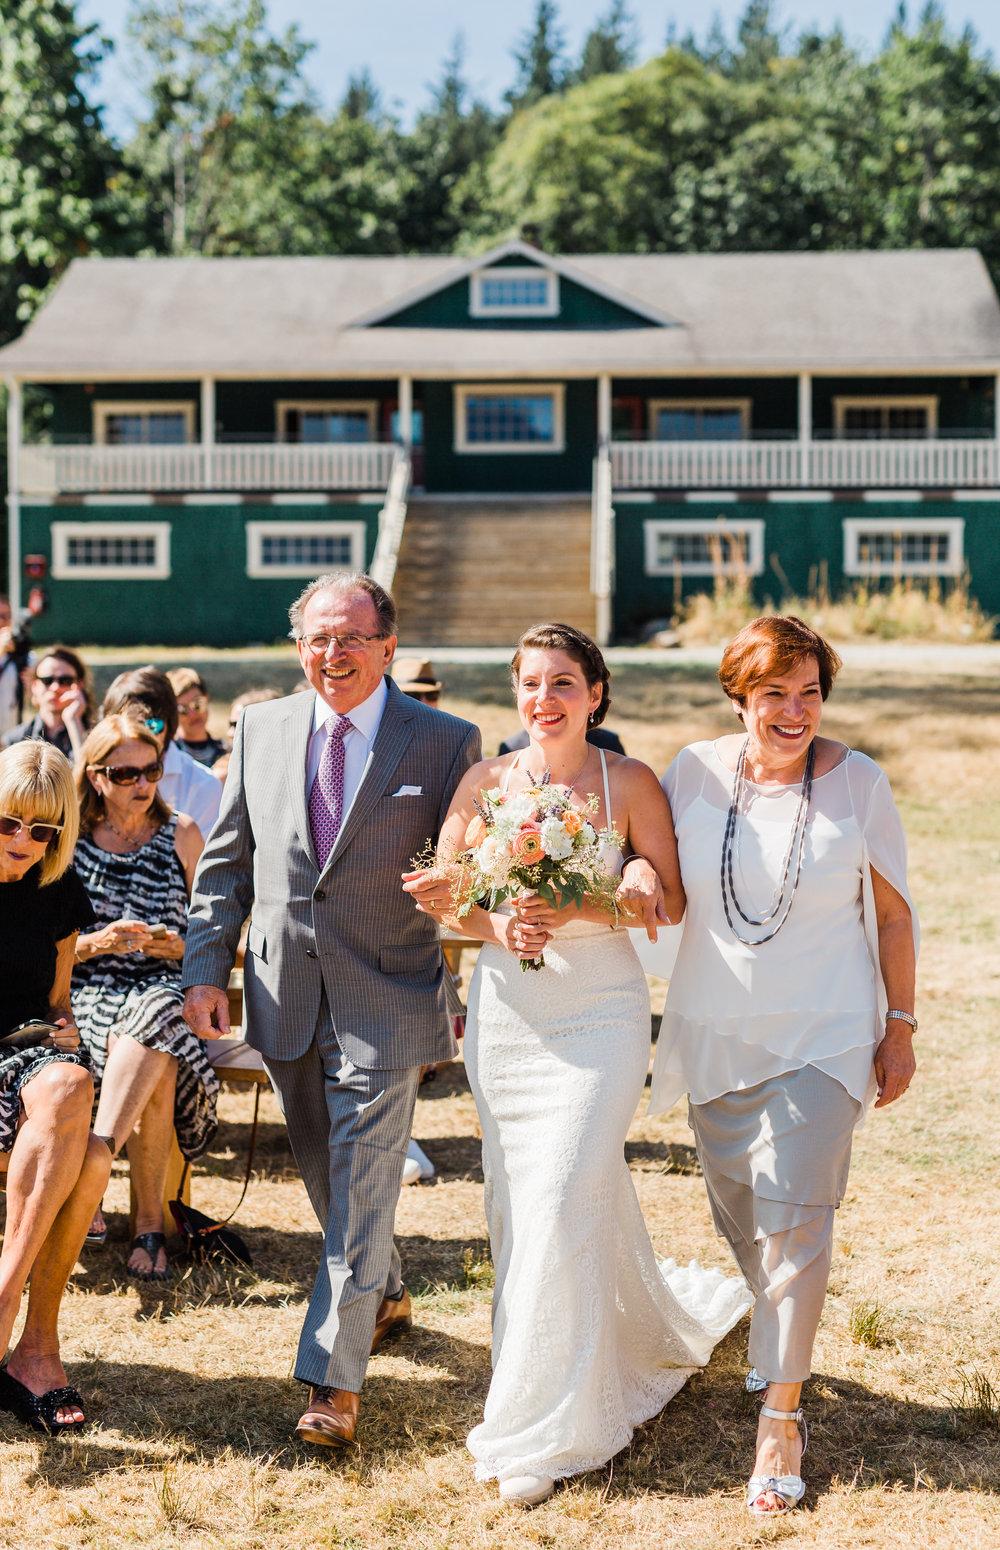 Camp Fircom Wedding - Vancouver Wedding Photographer & Videographer - Sunshine Coast Wedding Photos - Sunshine Coast Wedding Photographer - Jennifer Picard Photography - IMG_0594.jpg